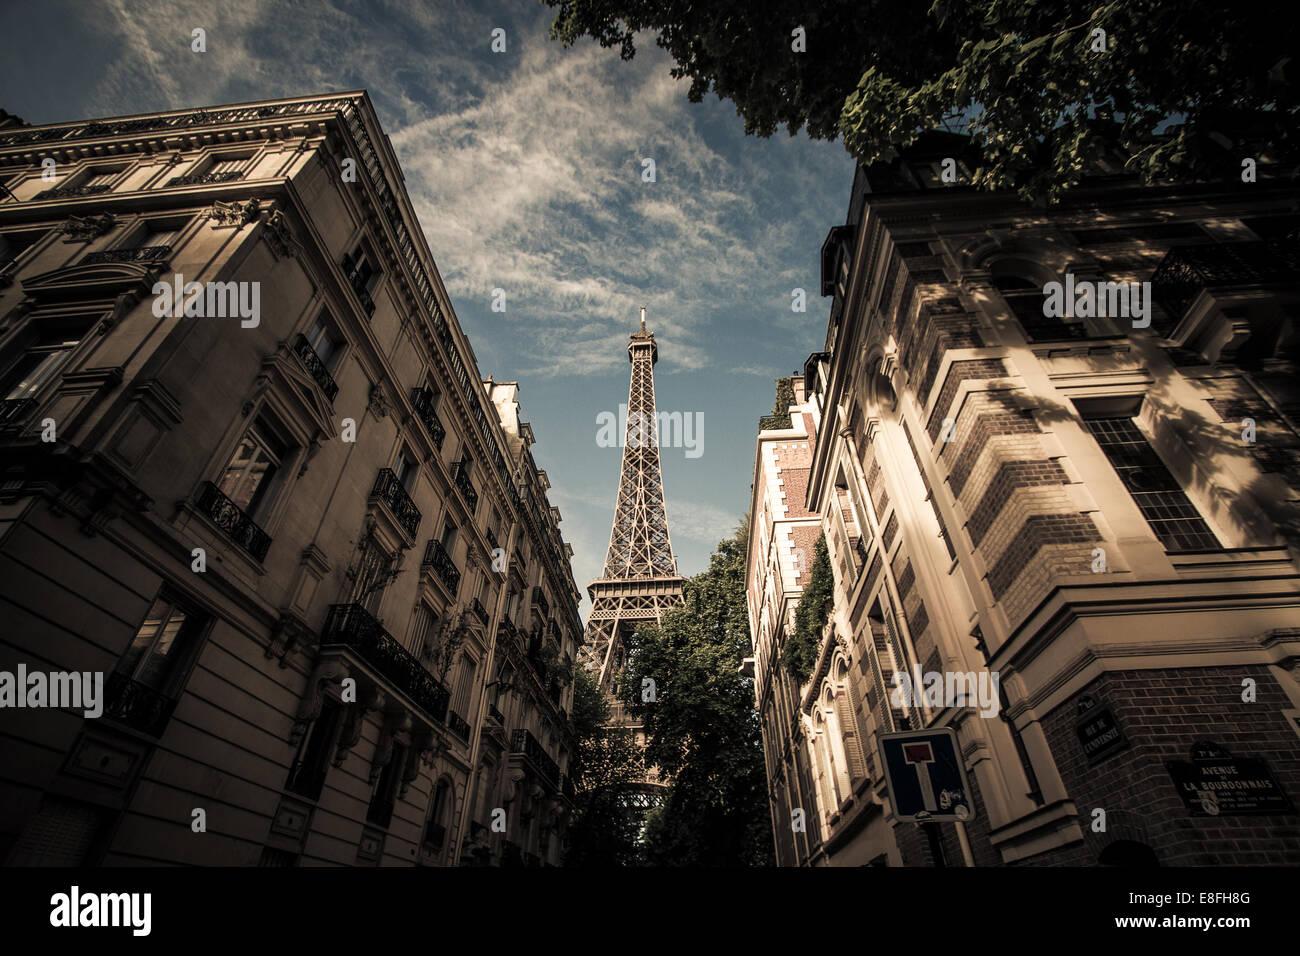 France, Paris, Tour Eiffel vu de street Photo Stock